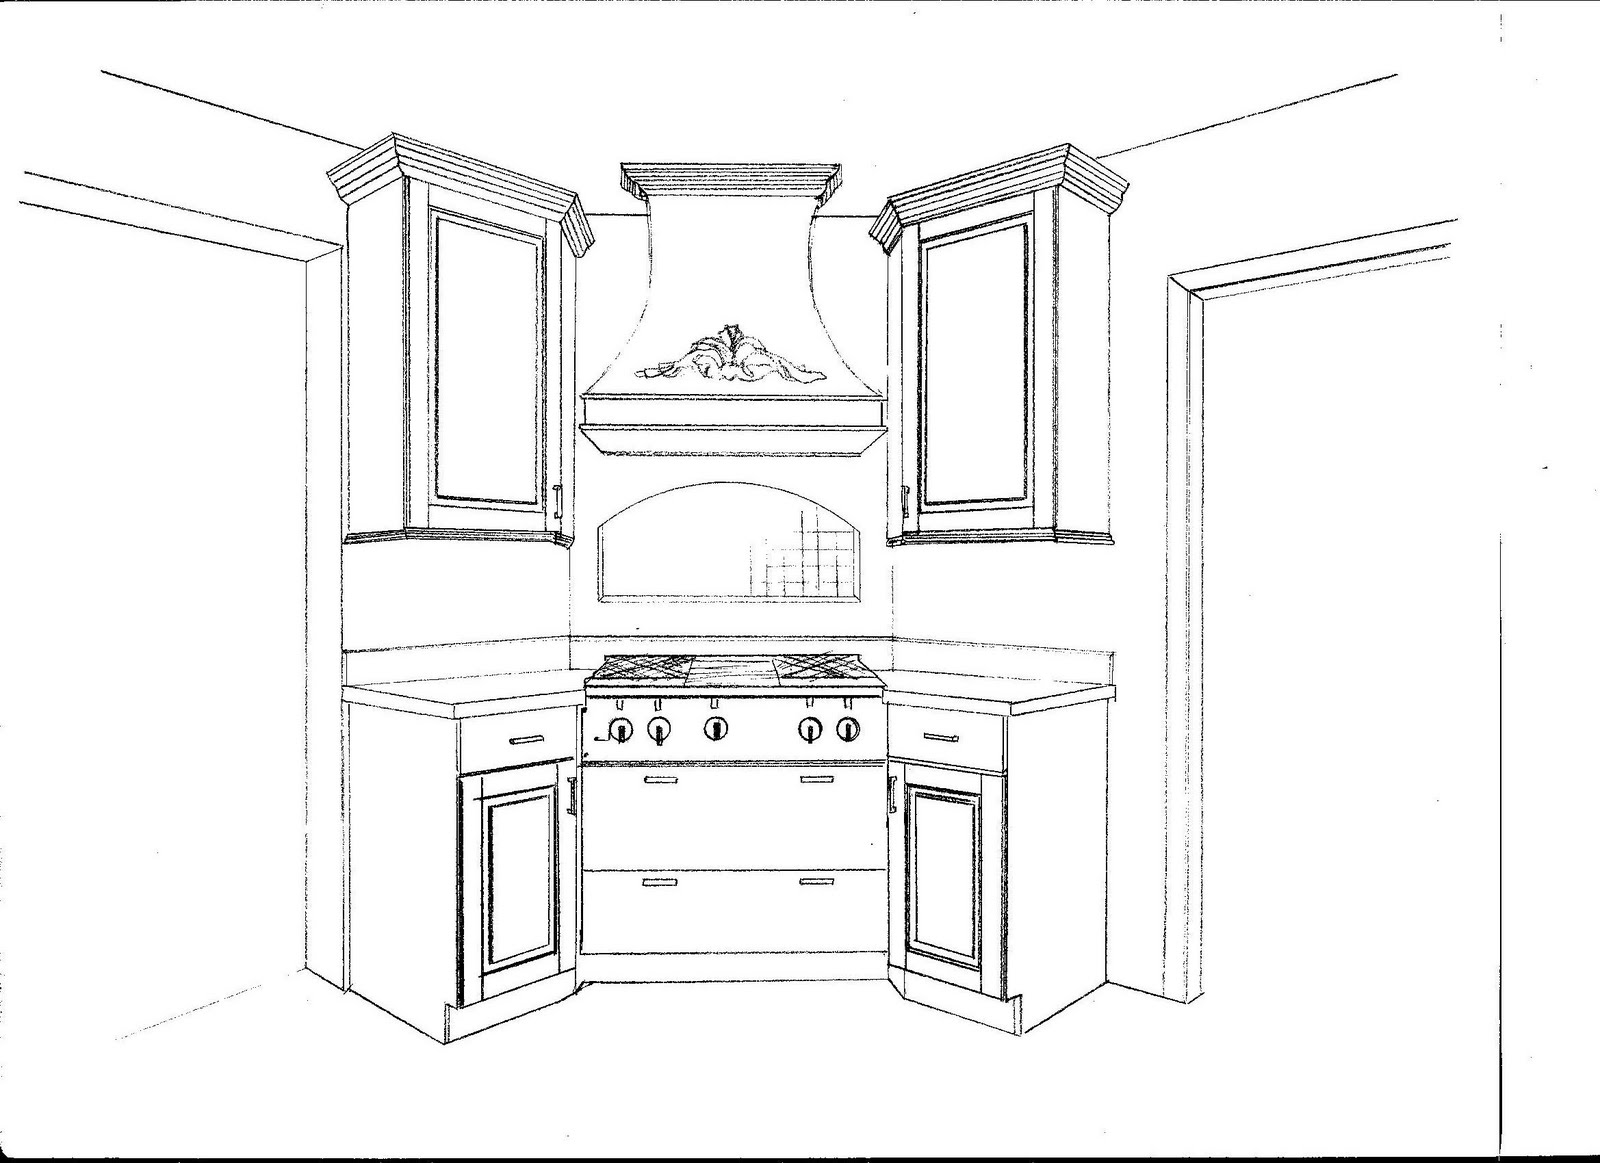 Jane - Cooktop In The Corner's Home: Plans: Kitchen Renderings